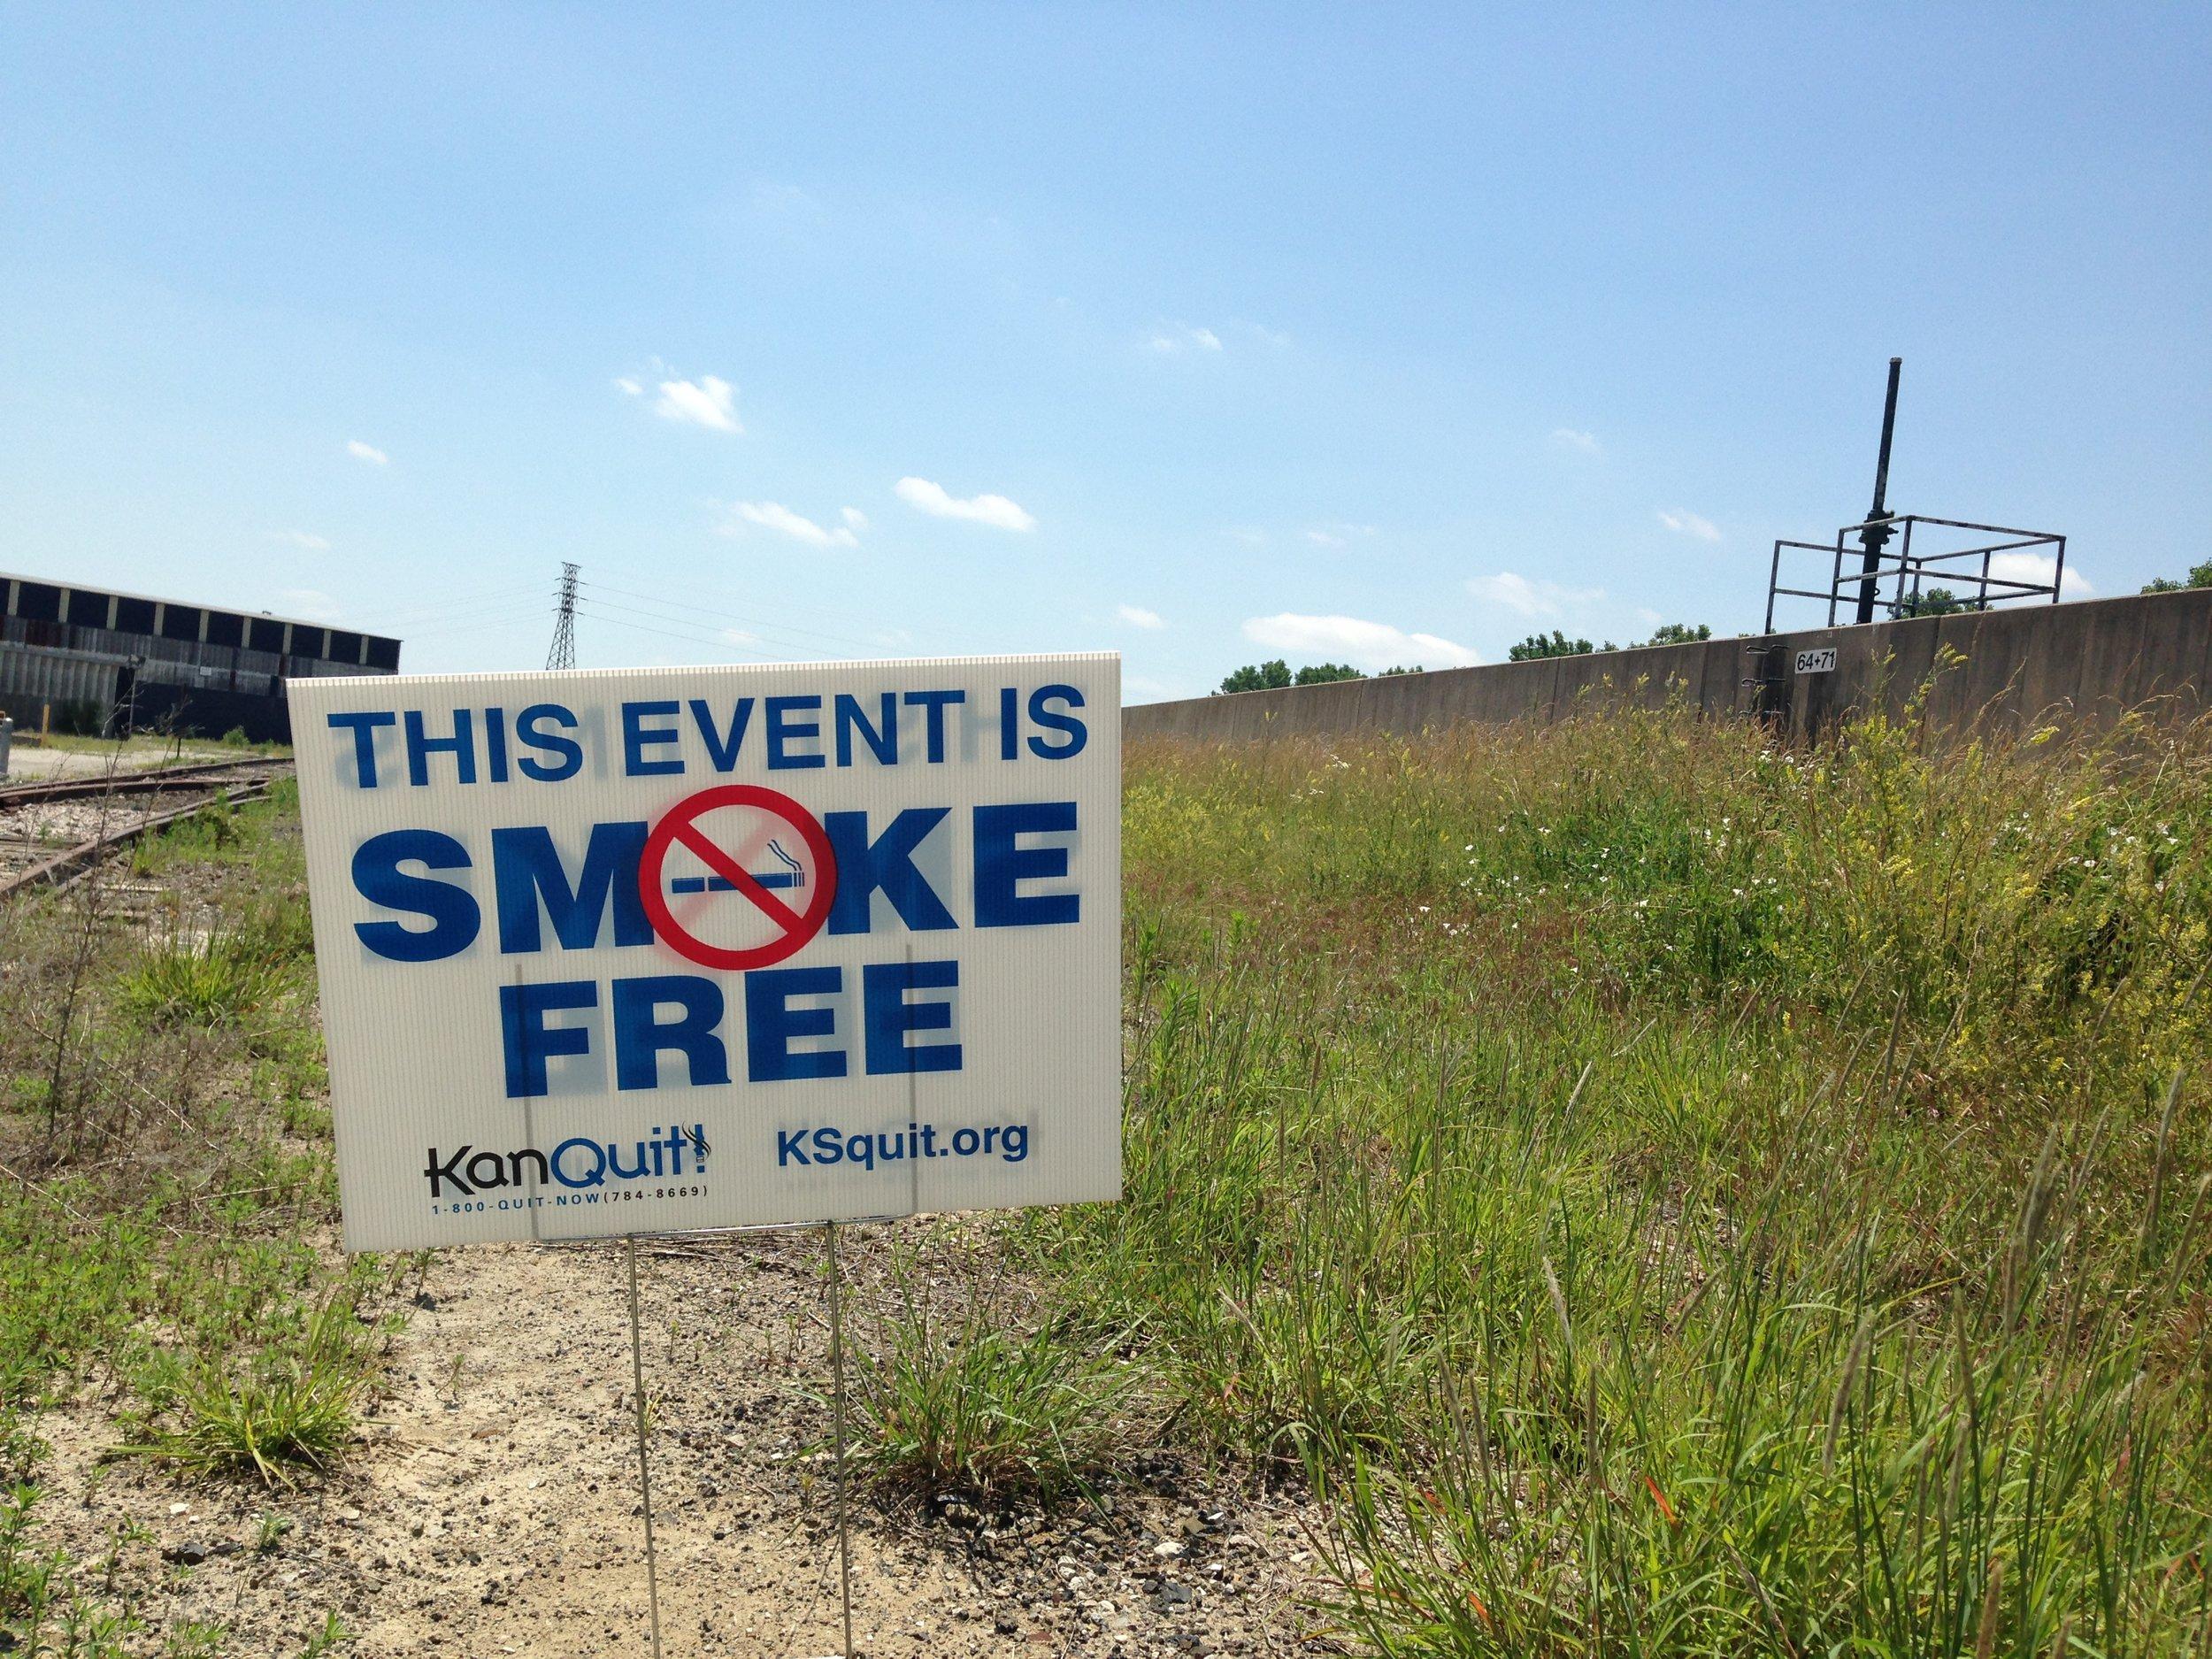 Smoke free event sign.JPG